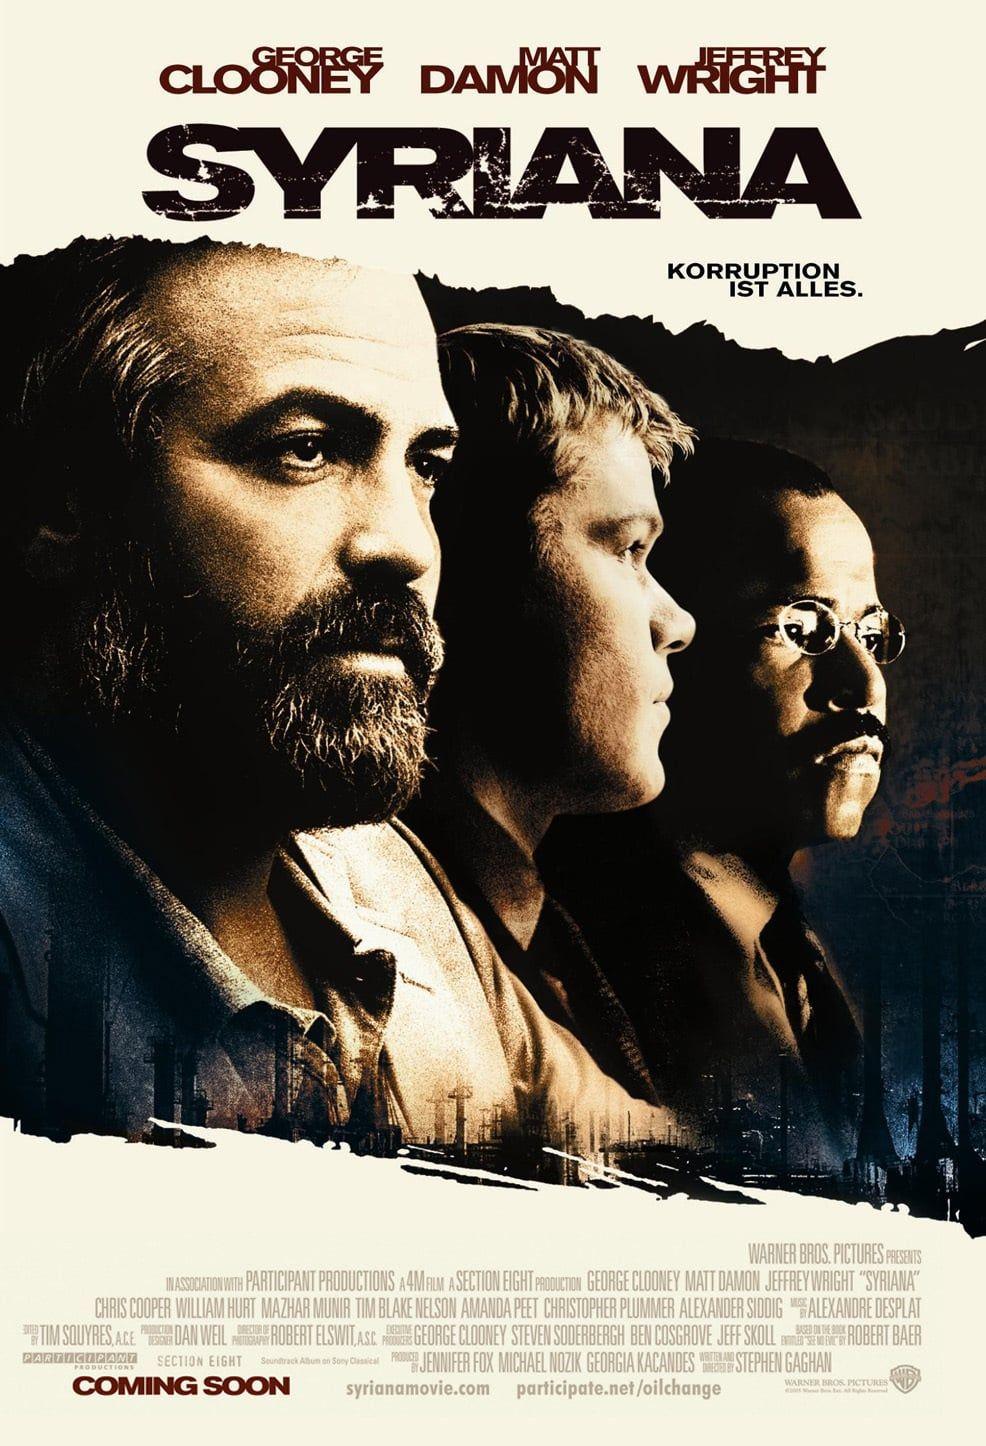 Syriana Pelicula Completa En Espanol Latino Syriana Pelicula Completa Audio Latino Syriana Pelicula Completa Castellano Syr George Clooney Matt Damon Dvd